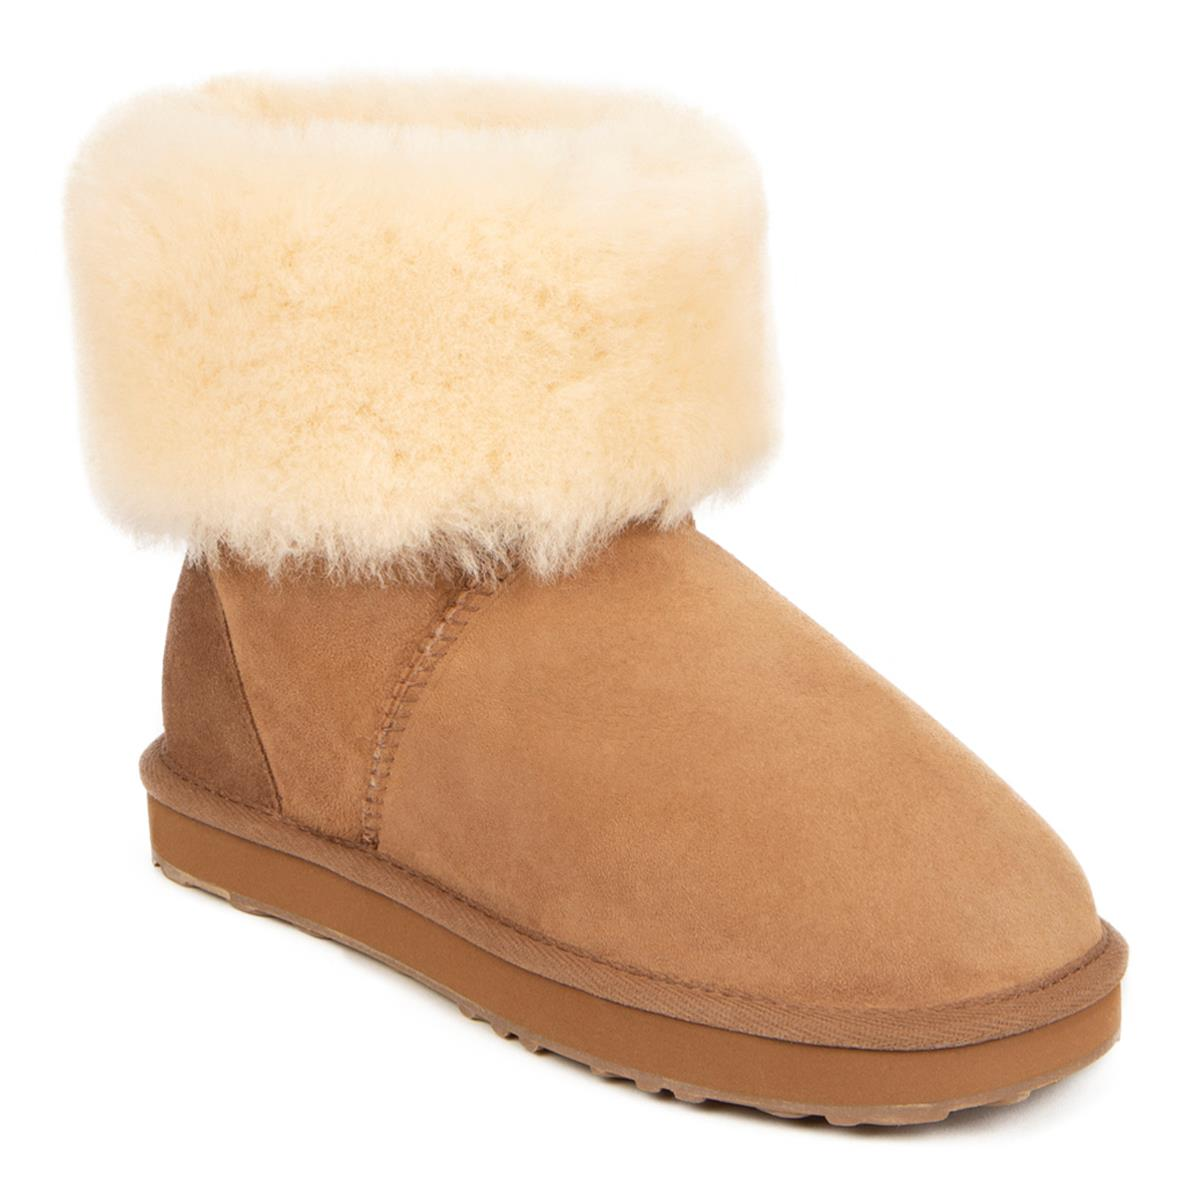 e2954b30cf5 Ladies Cornwall Sheepskin Boots Chestnut